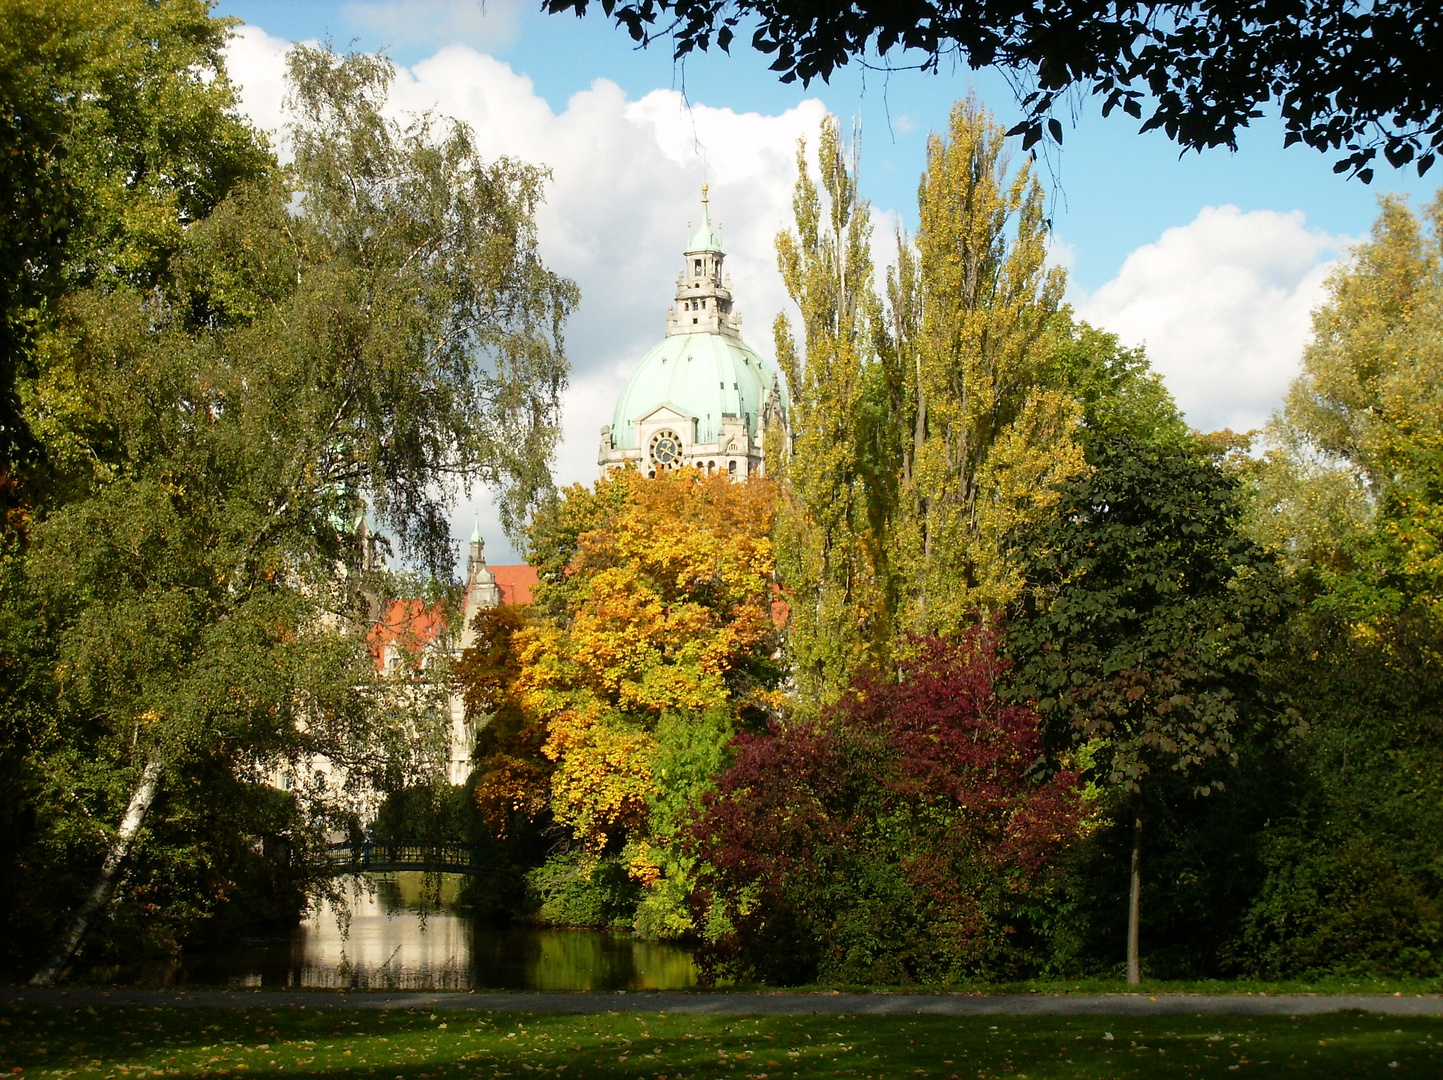 Rathaus Hannover im Oktober 2012